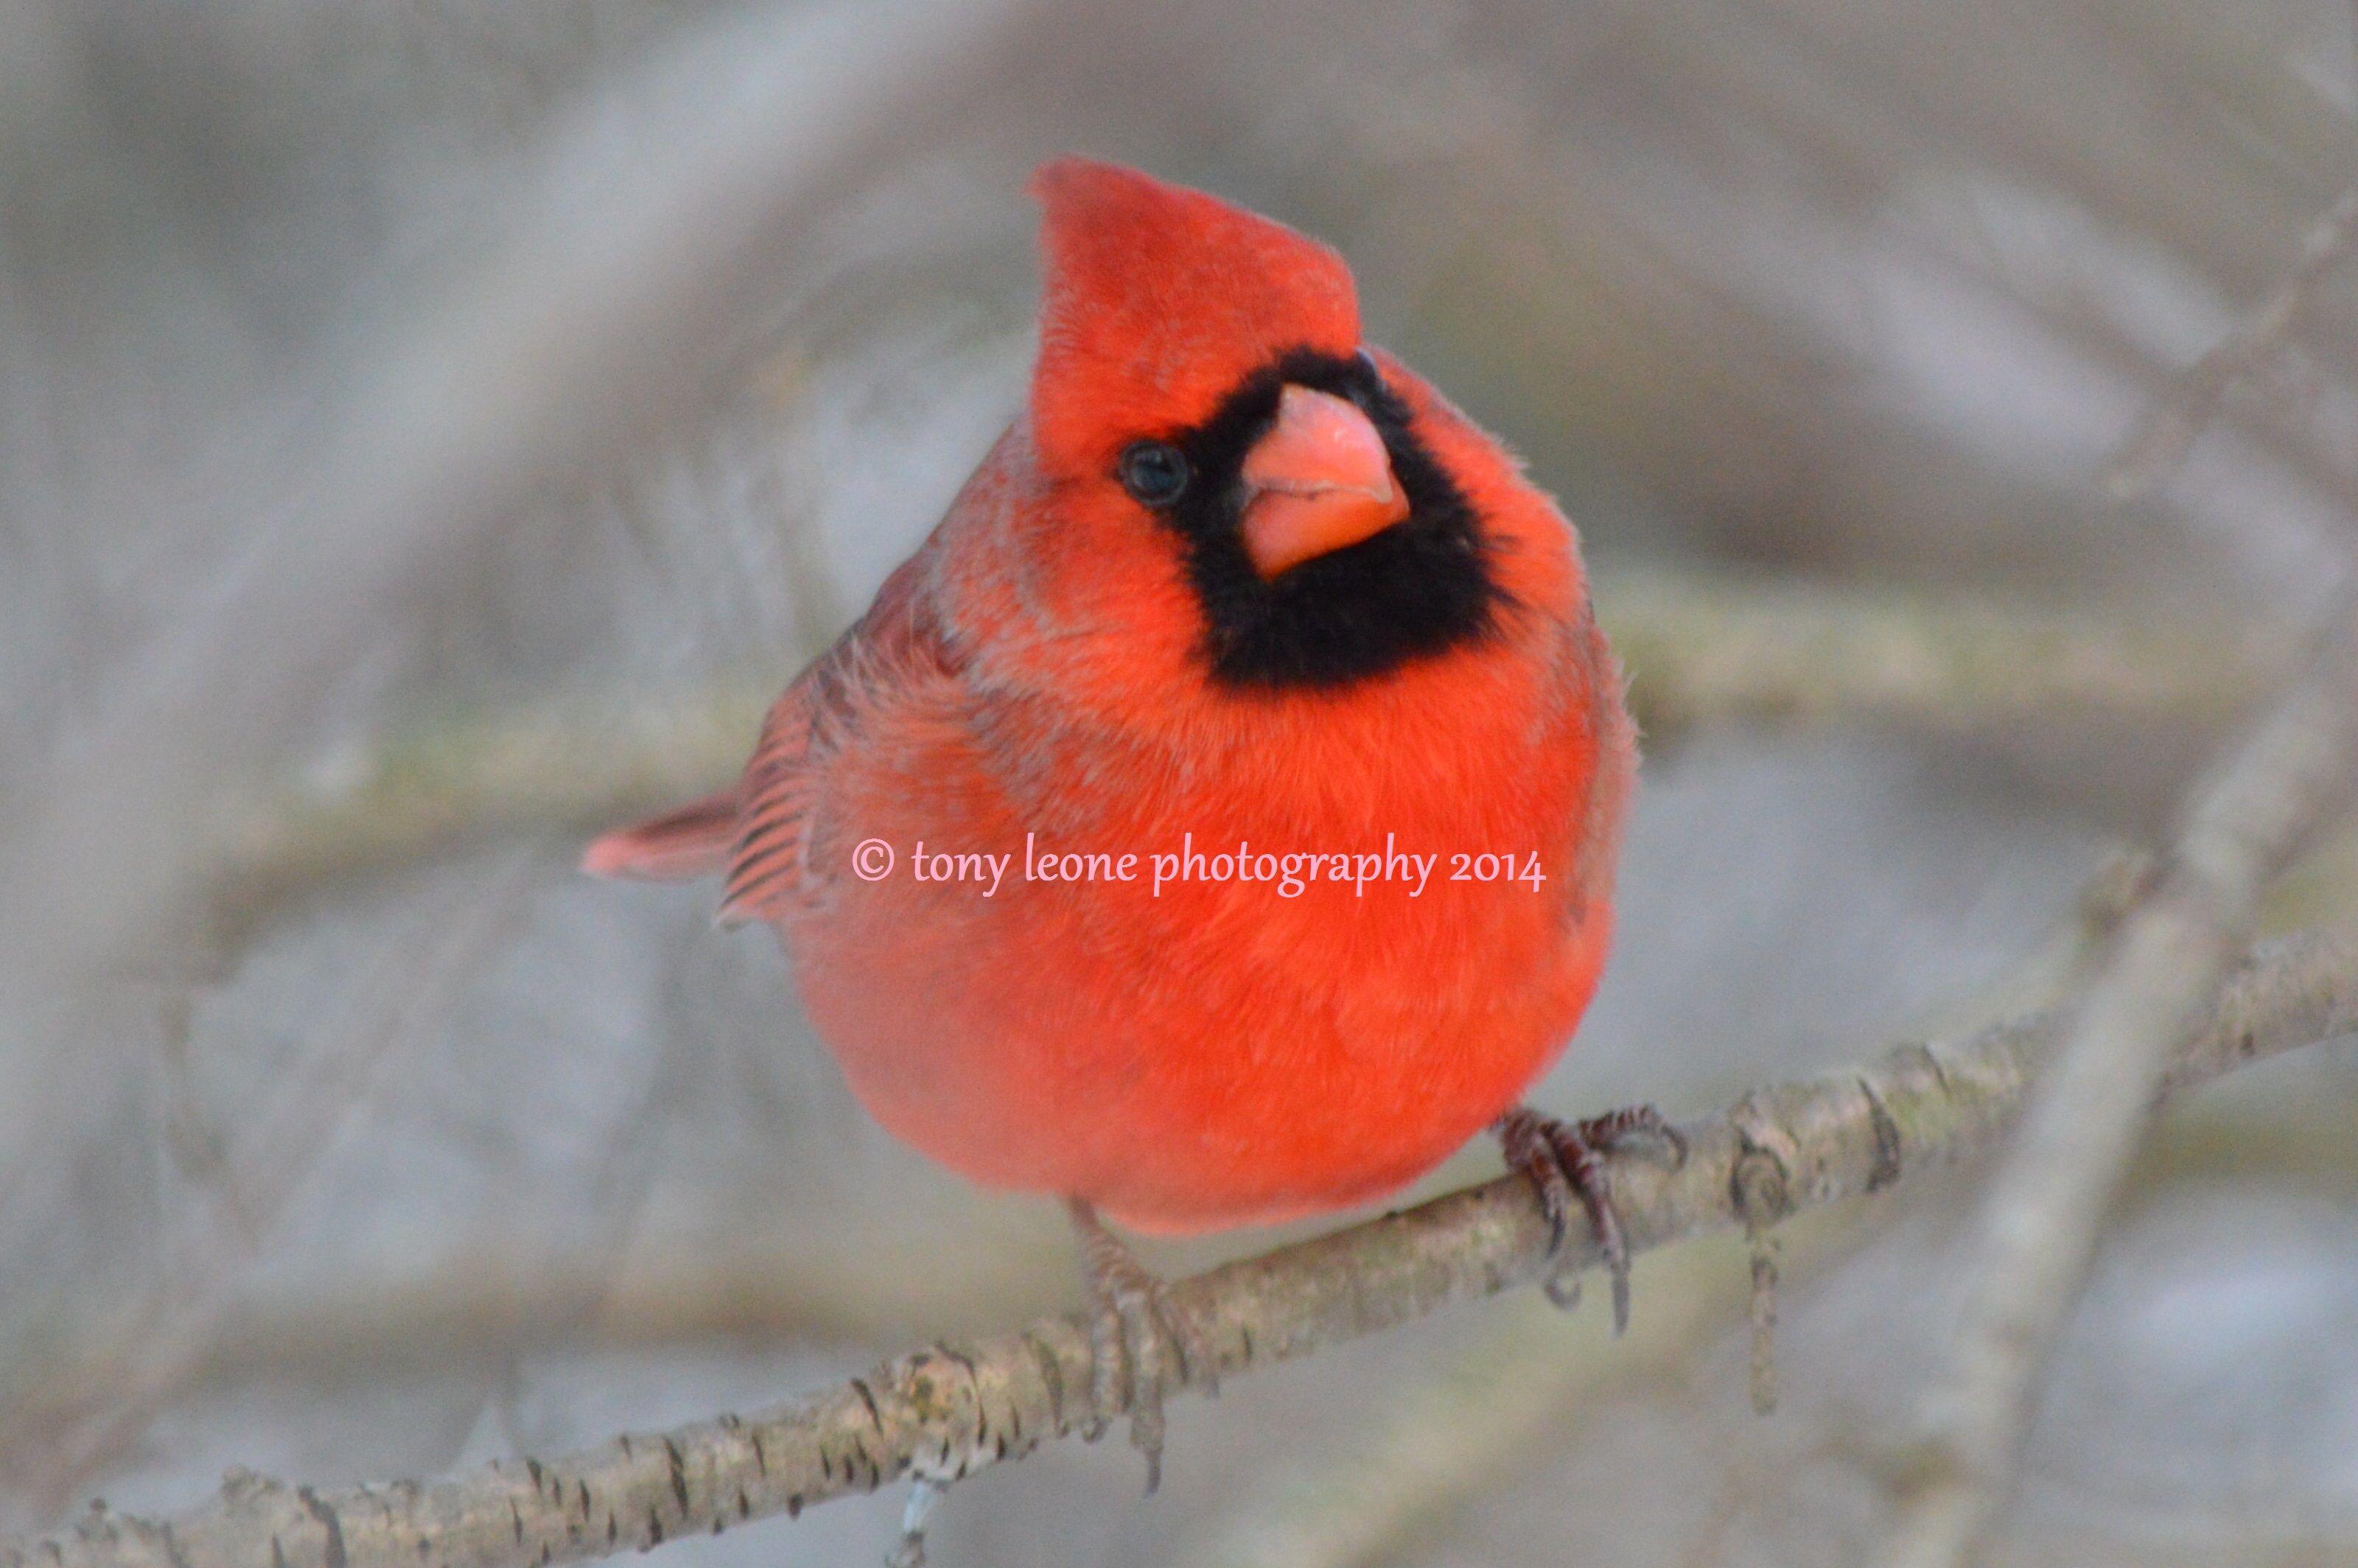 Beautiful Red Male Cardinal Print For Frame A 7 Cardinal Print Animals Digital Prints